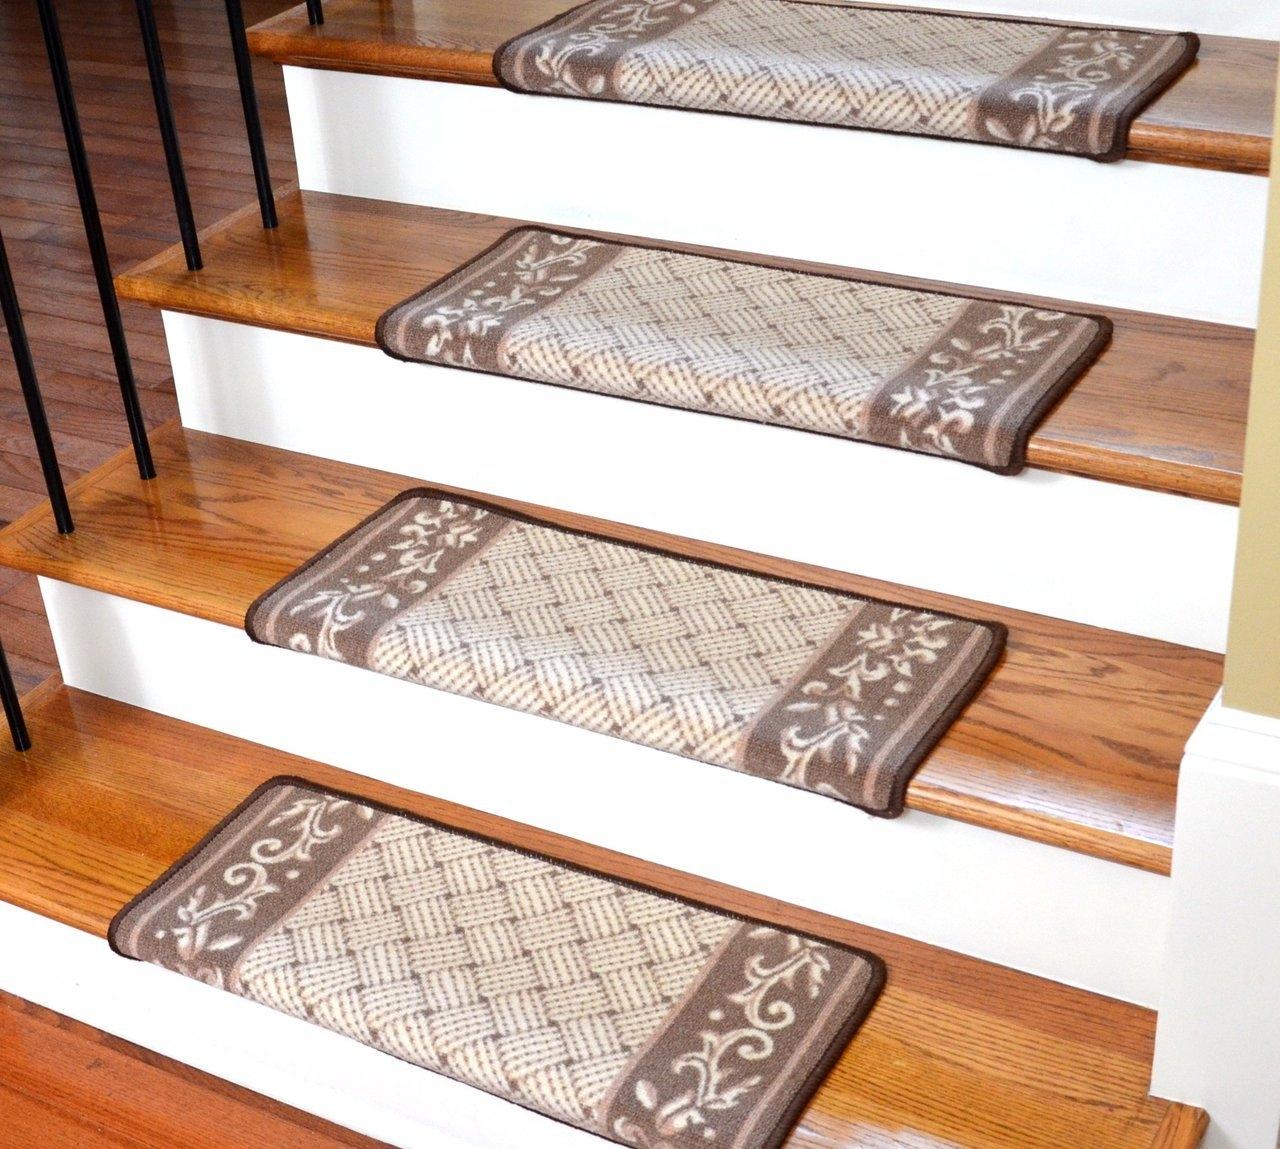 Amazing Bullnose Carpet Stair Treads Modern Carpet Treads For Within Bullnose Stair Tread Rugs (Image 1 of 15)